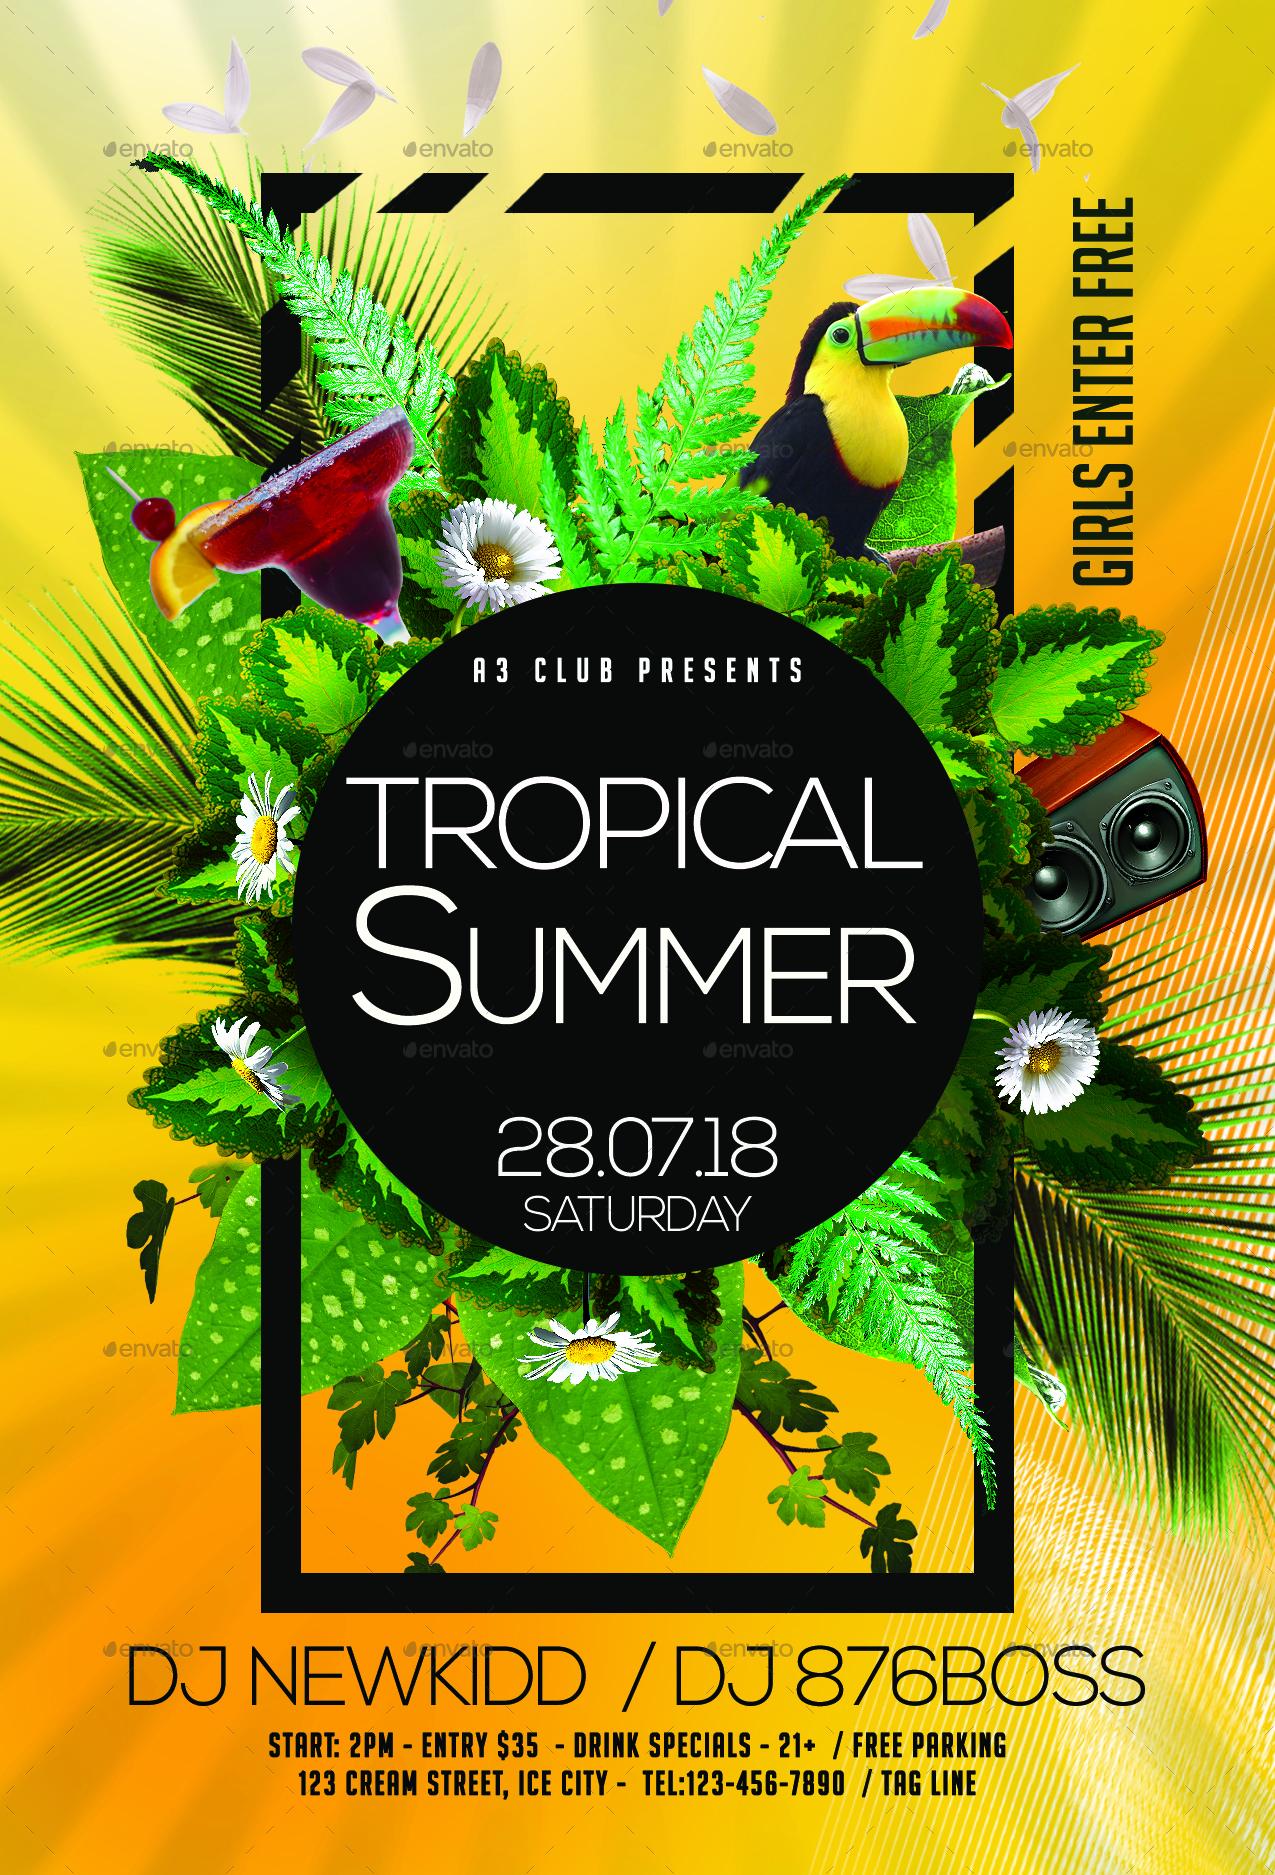 tropical summer flyer by arrow3000